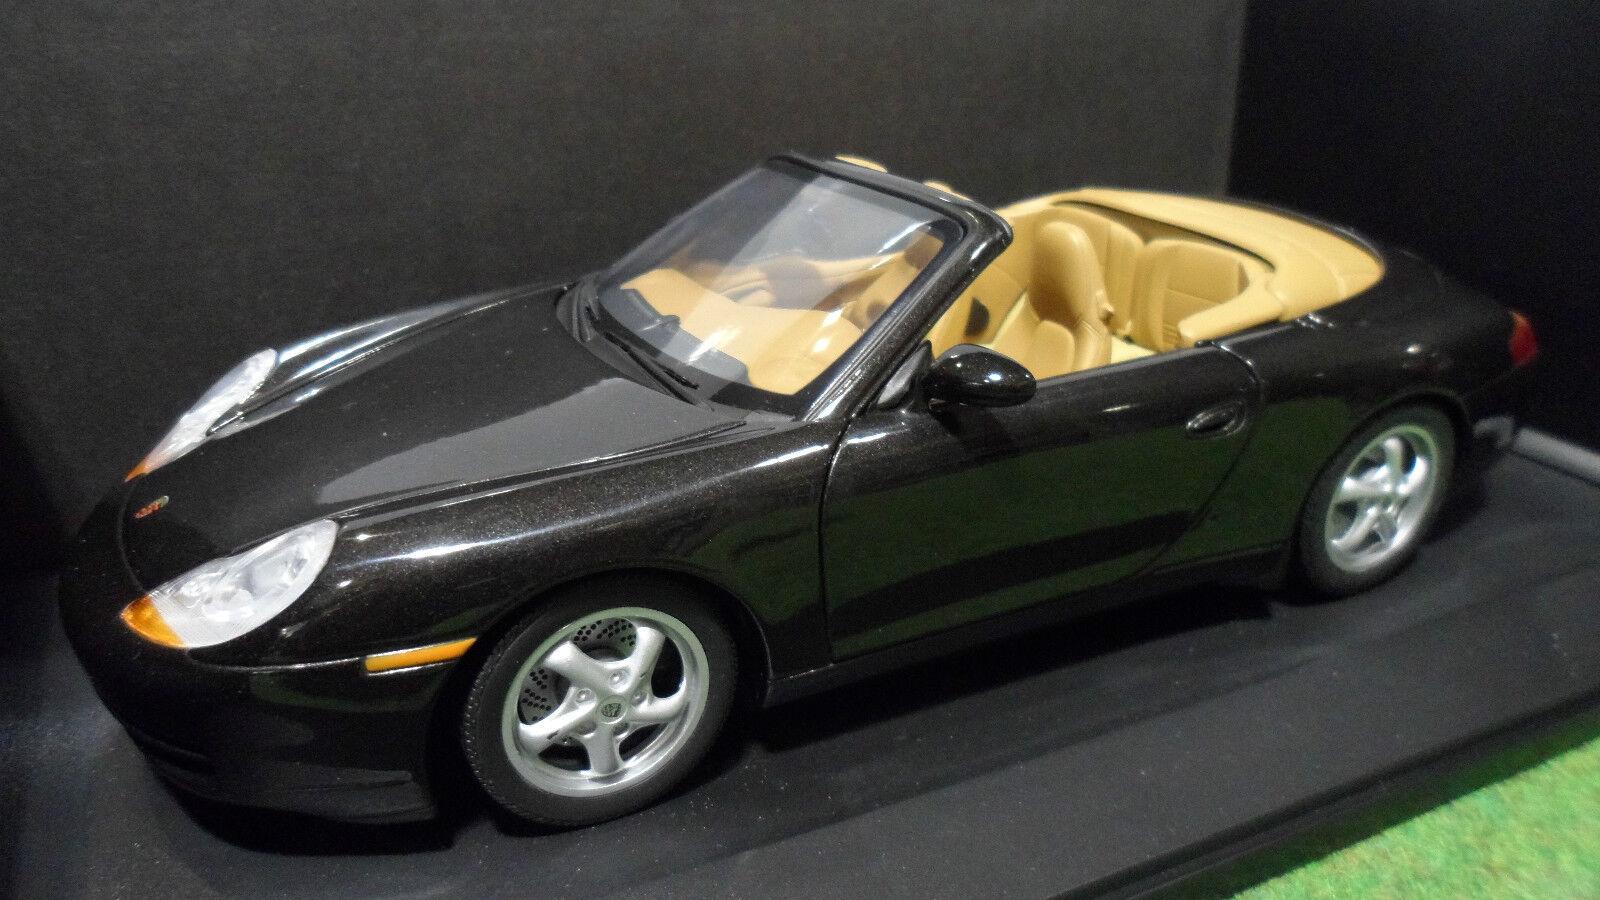 PORSCHE 911 CARRERA CABRIOLET 996 nero 1 18 UT Models WAP02100997 voiture